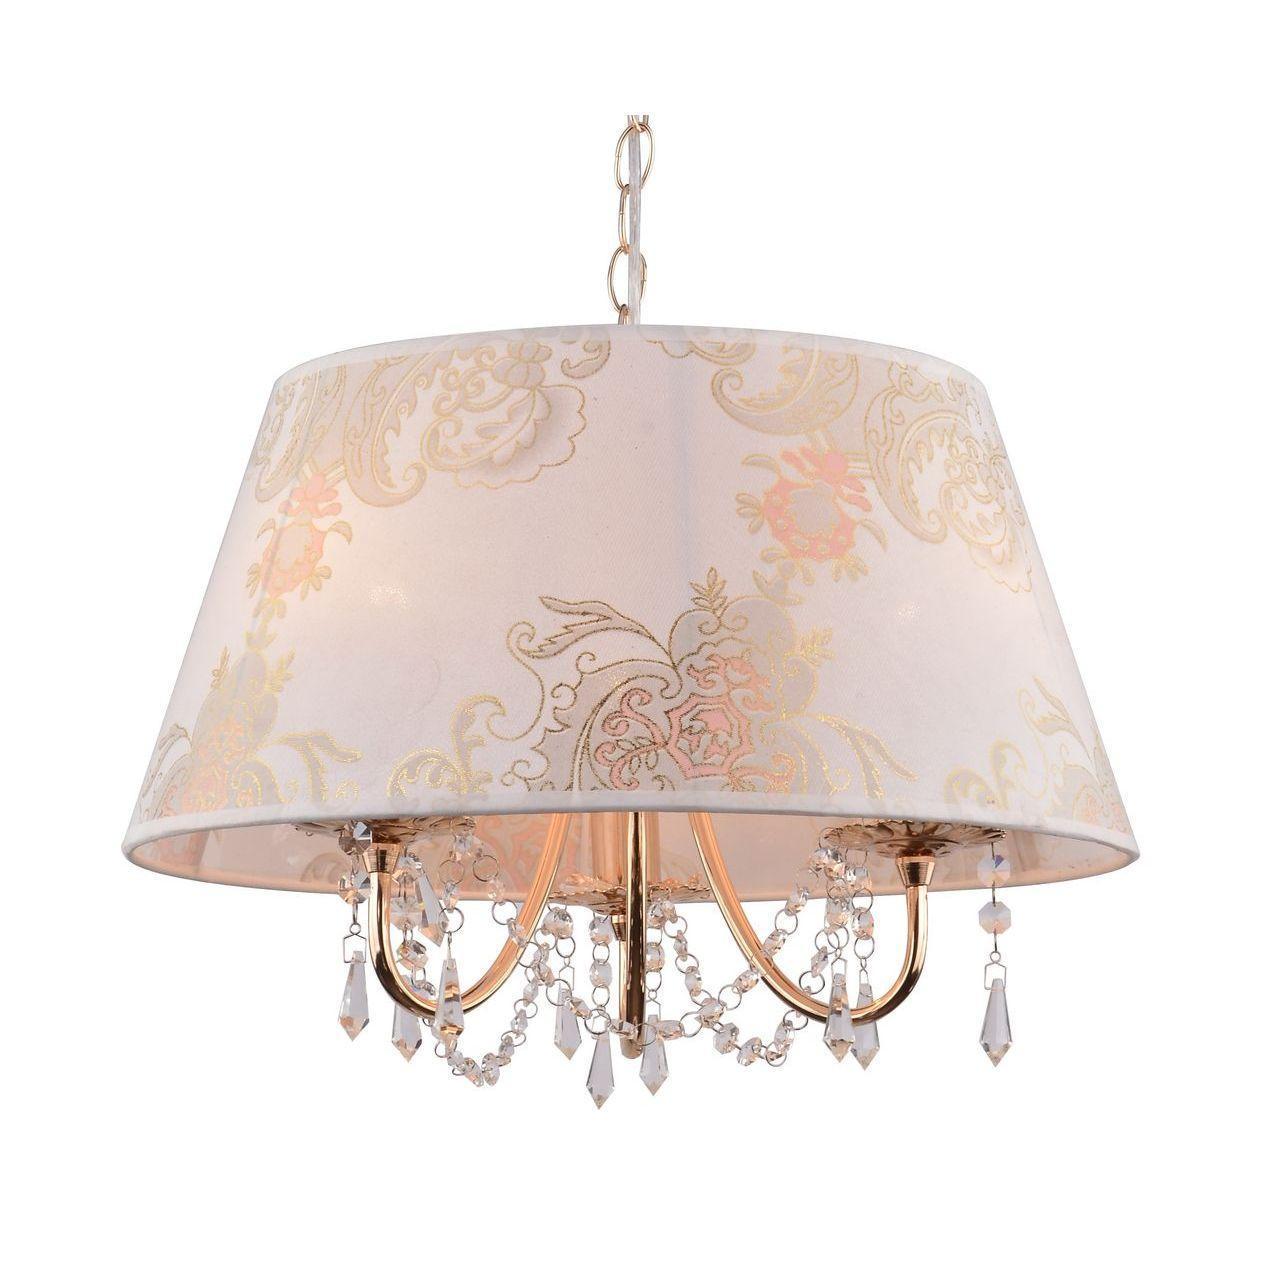 Люстра Arte Lamp Armonico A5008SP-3GO подвесная накладная люстра a6119pl 3go arte lamp